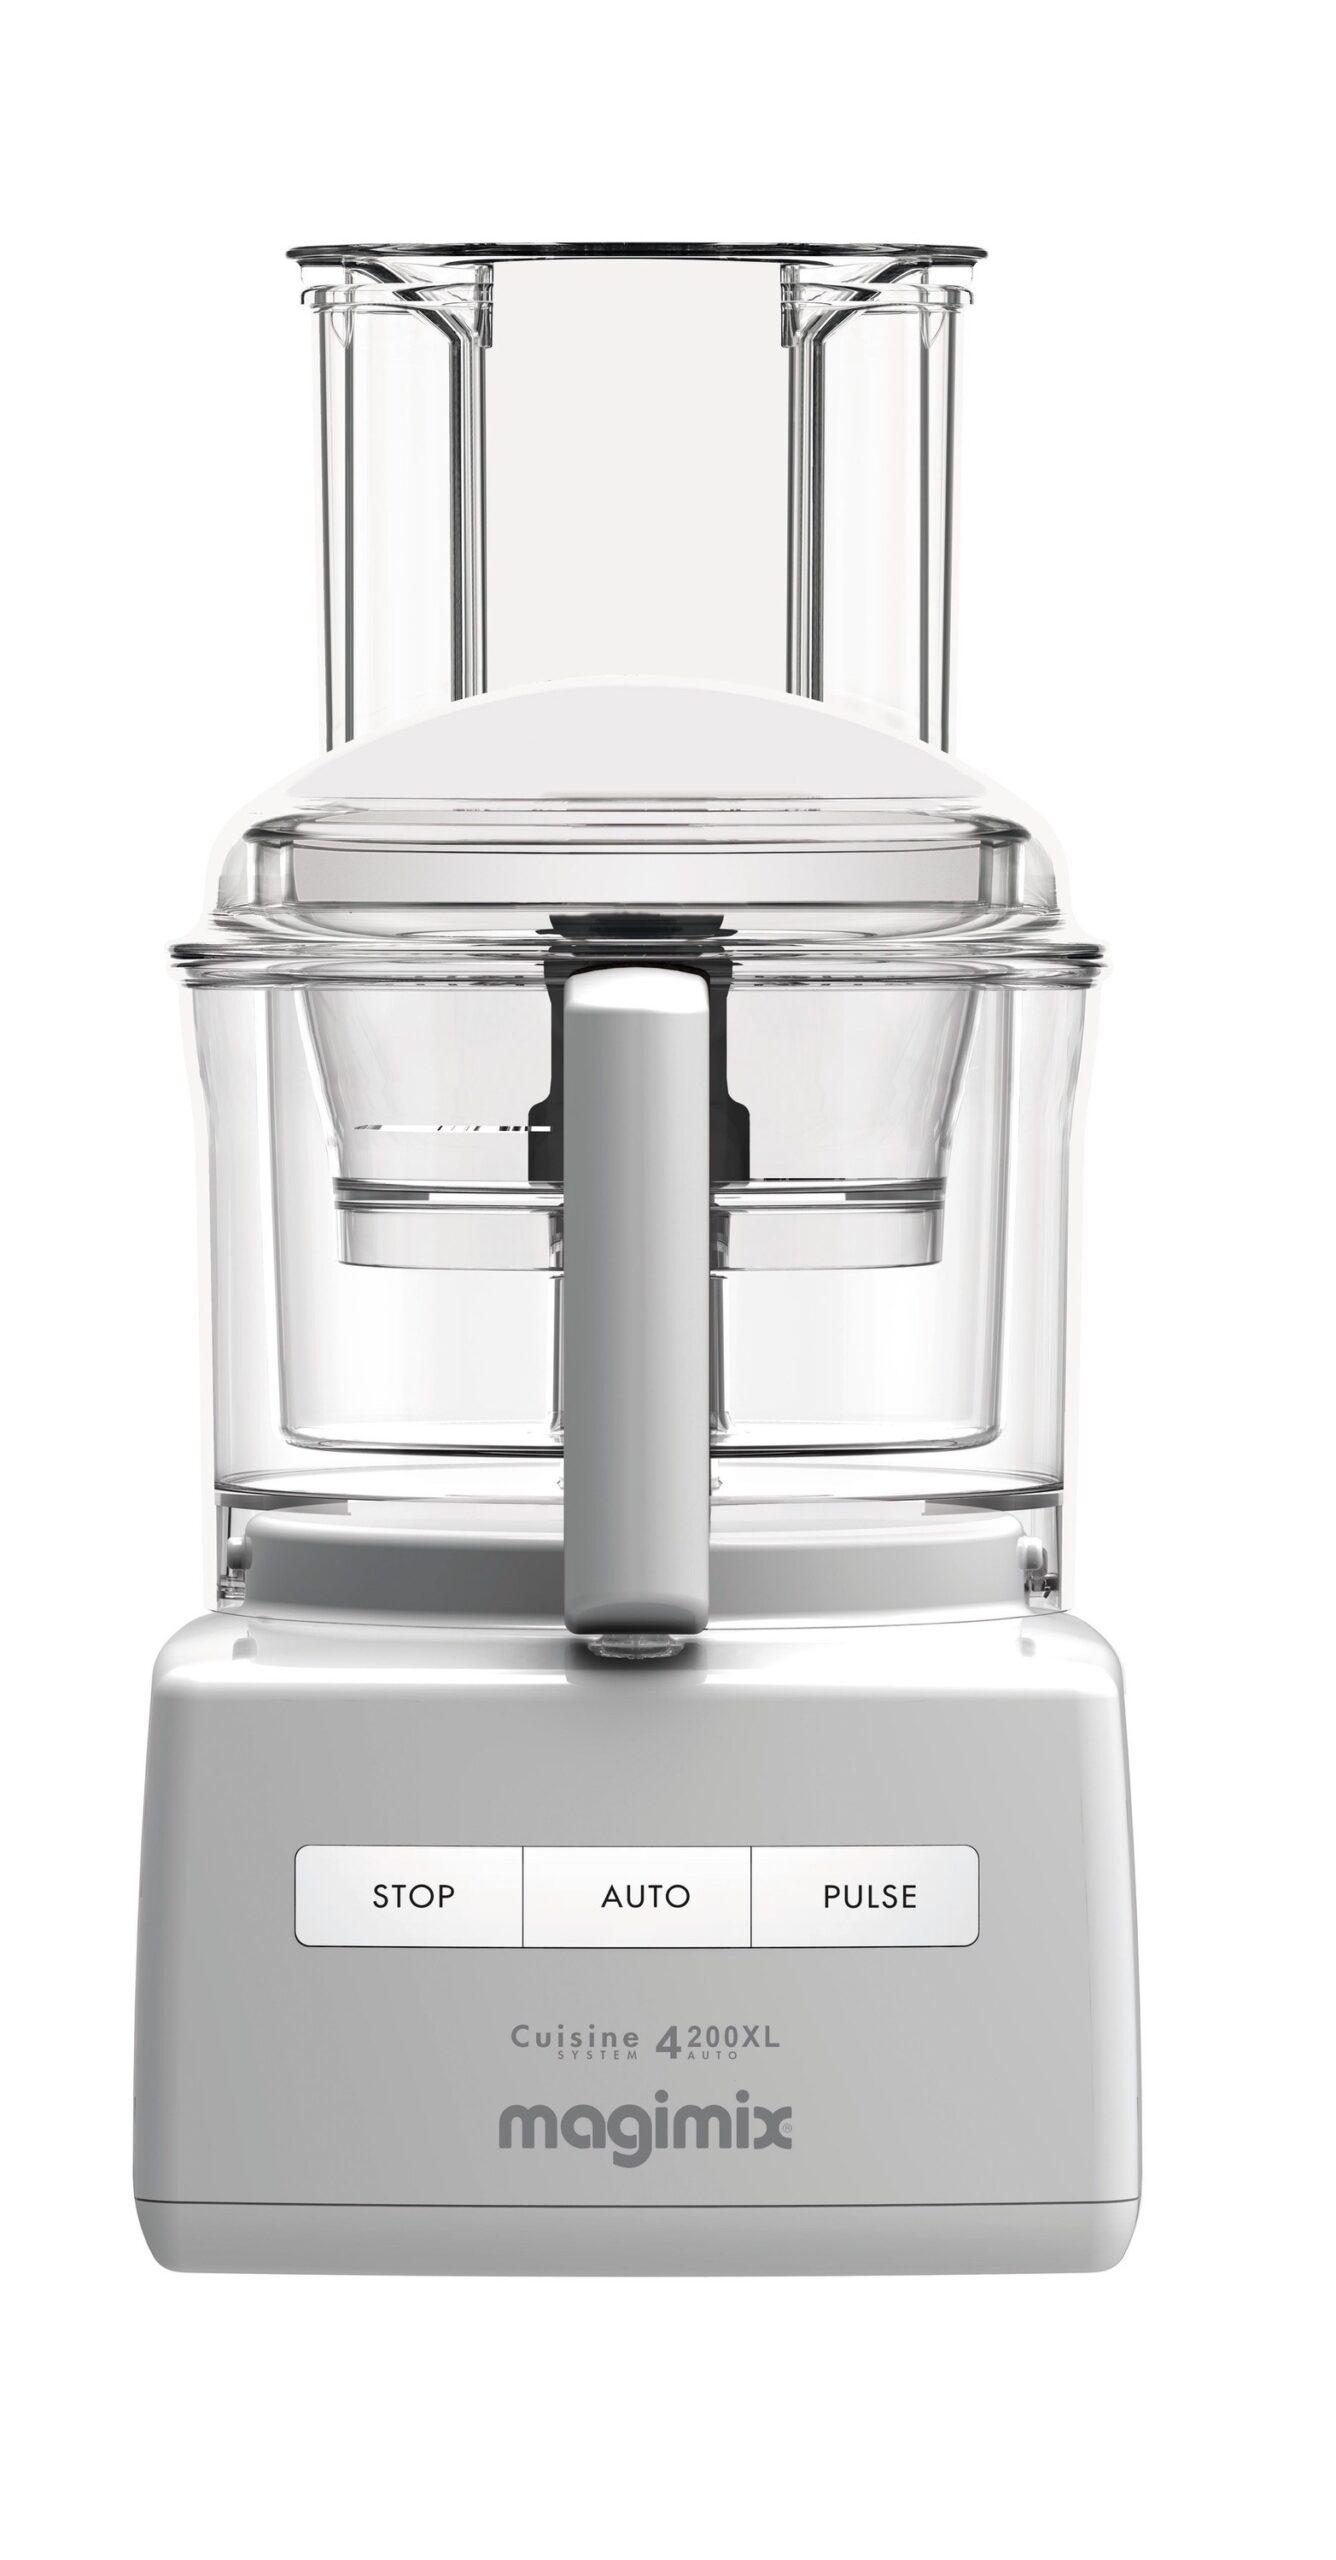 Magimix 4200XL Food Processor White